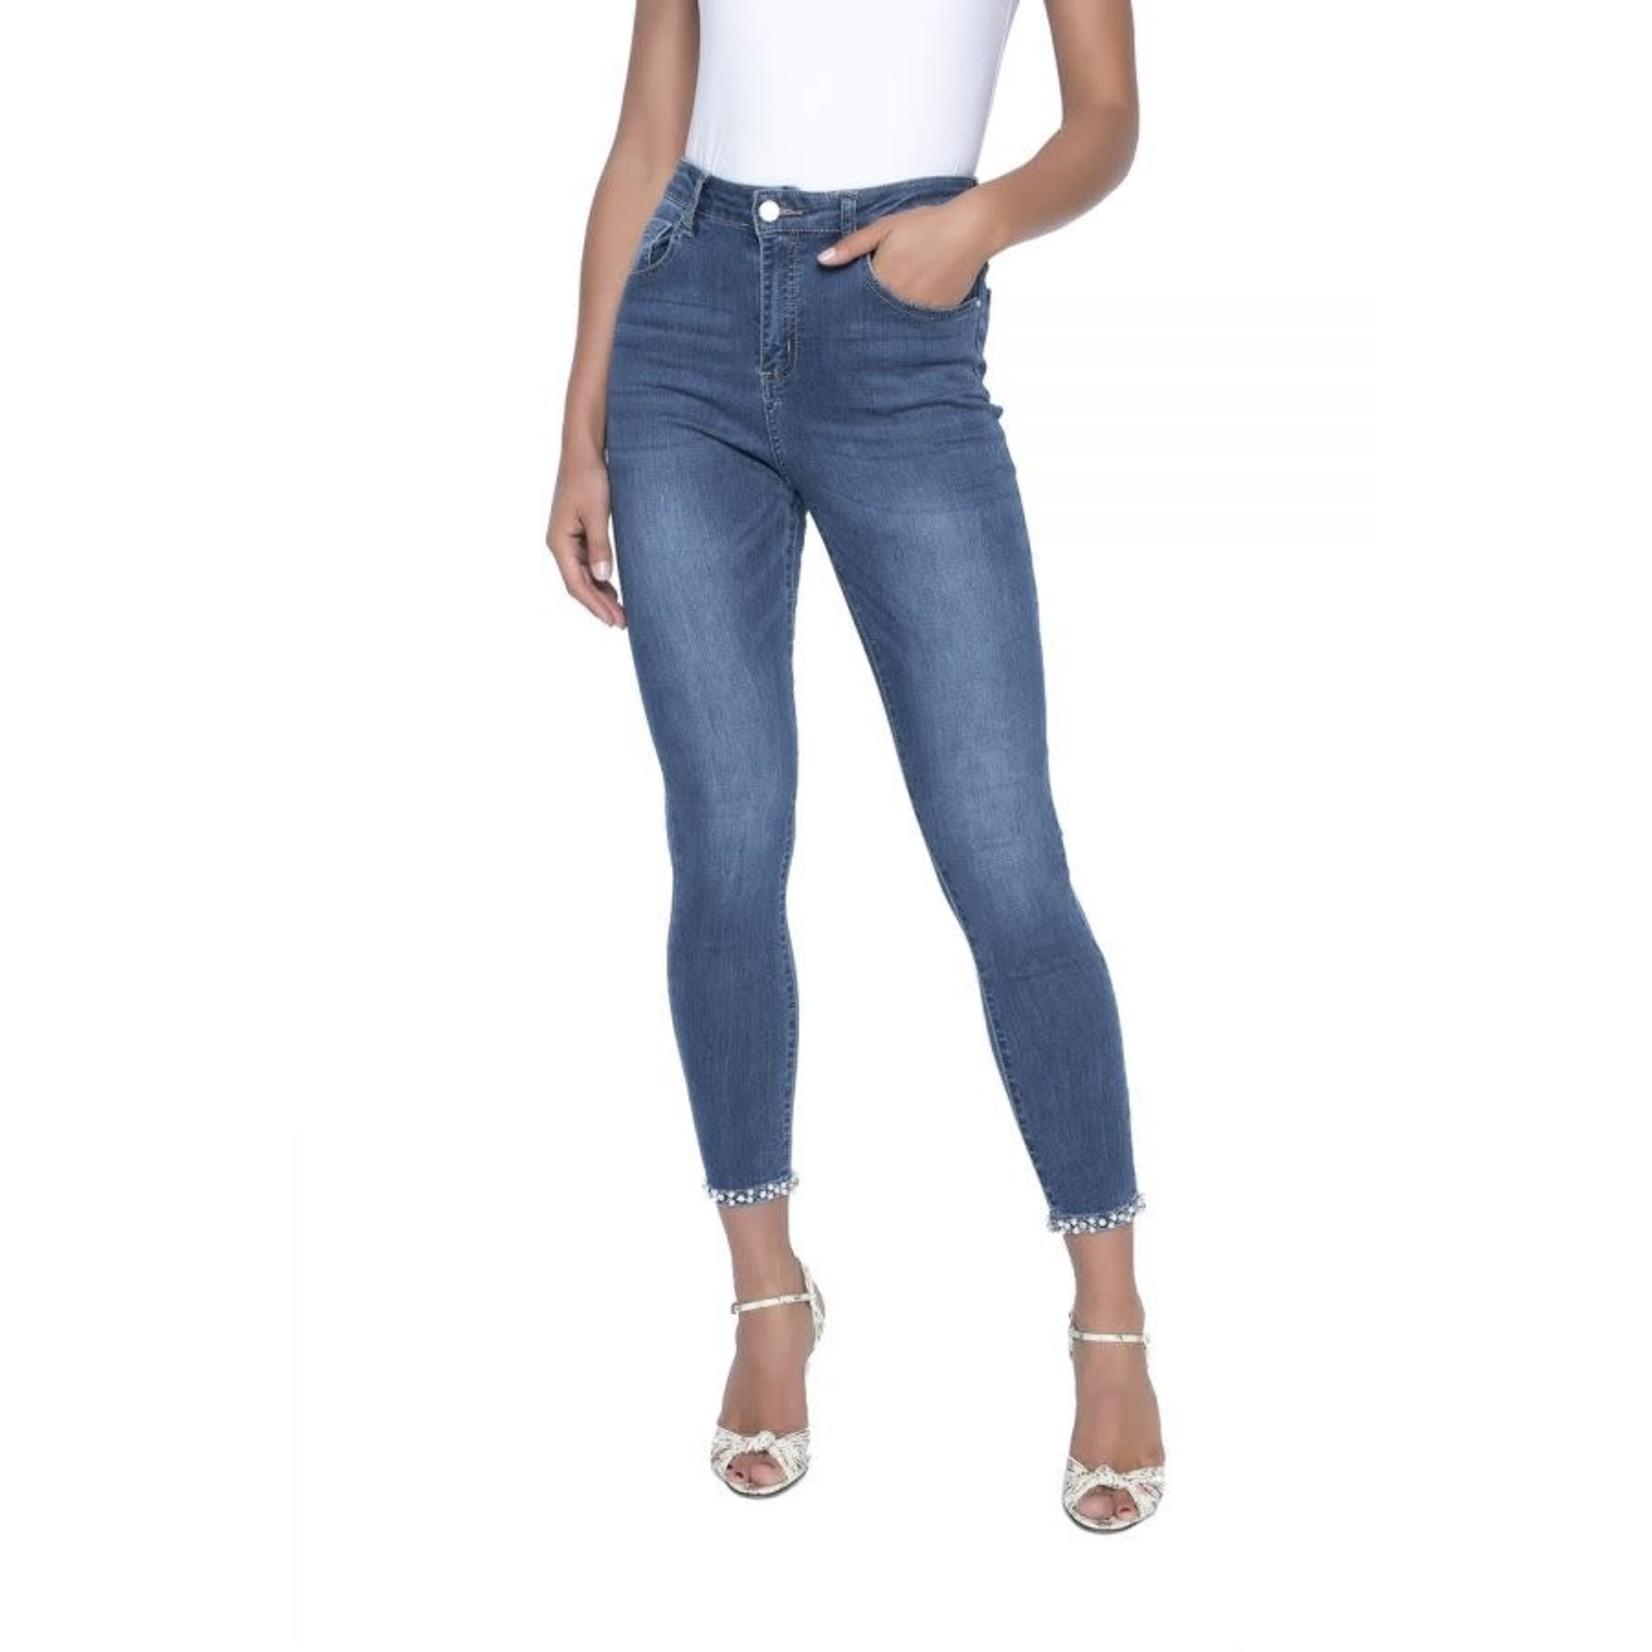 Dk Blue Jeans w/Pearl and Rhinestone Bow Embelllishmt